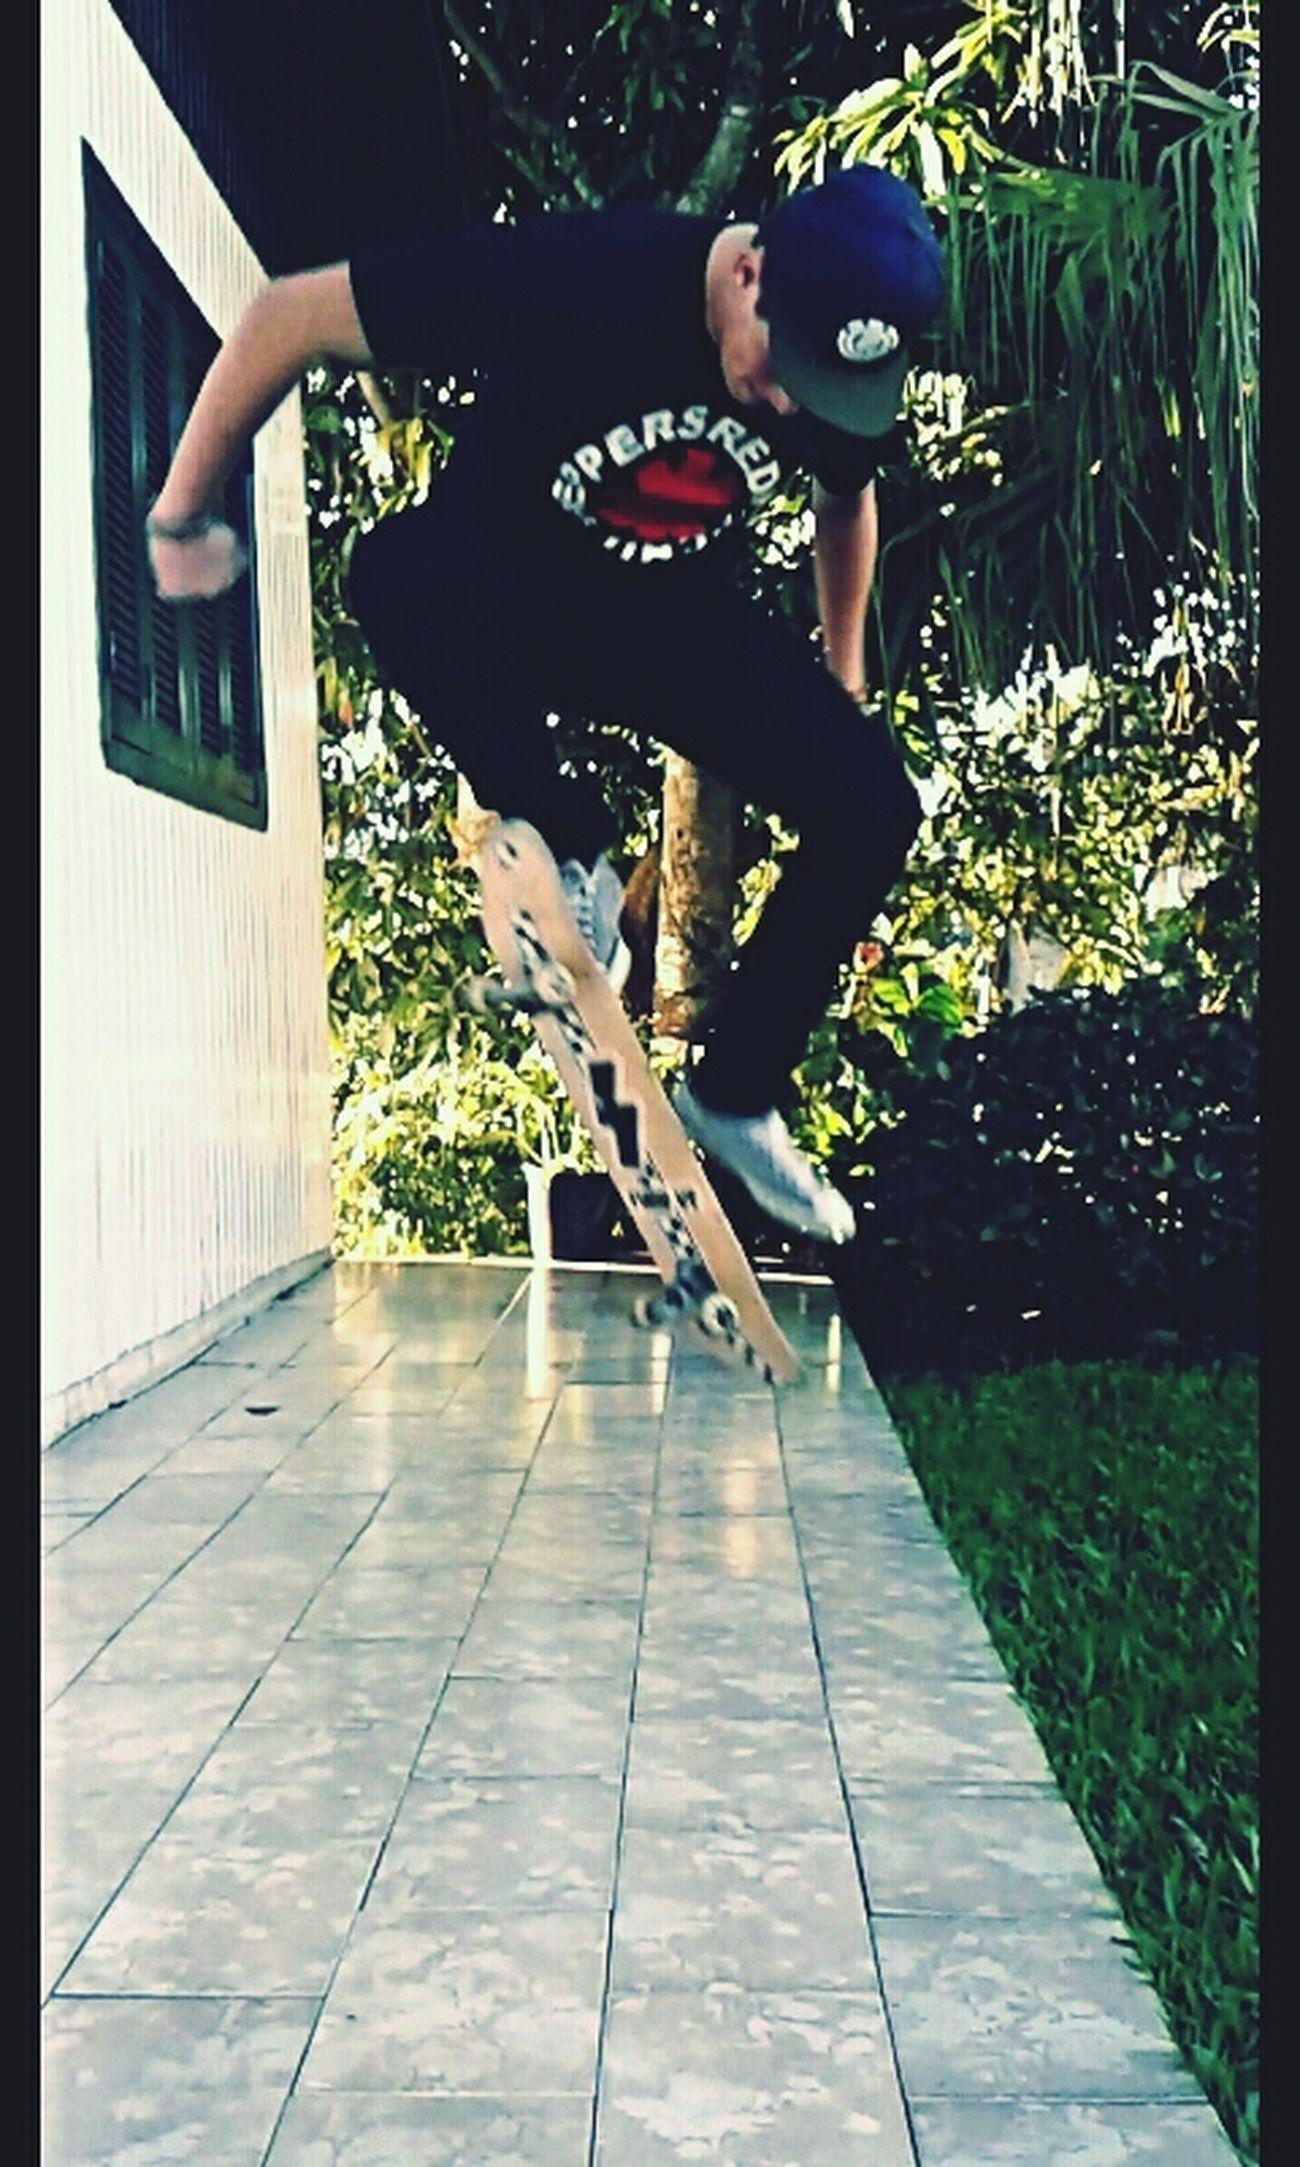 Skateboarding Enjoying Life